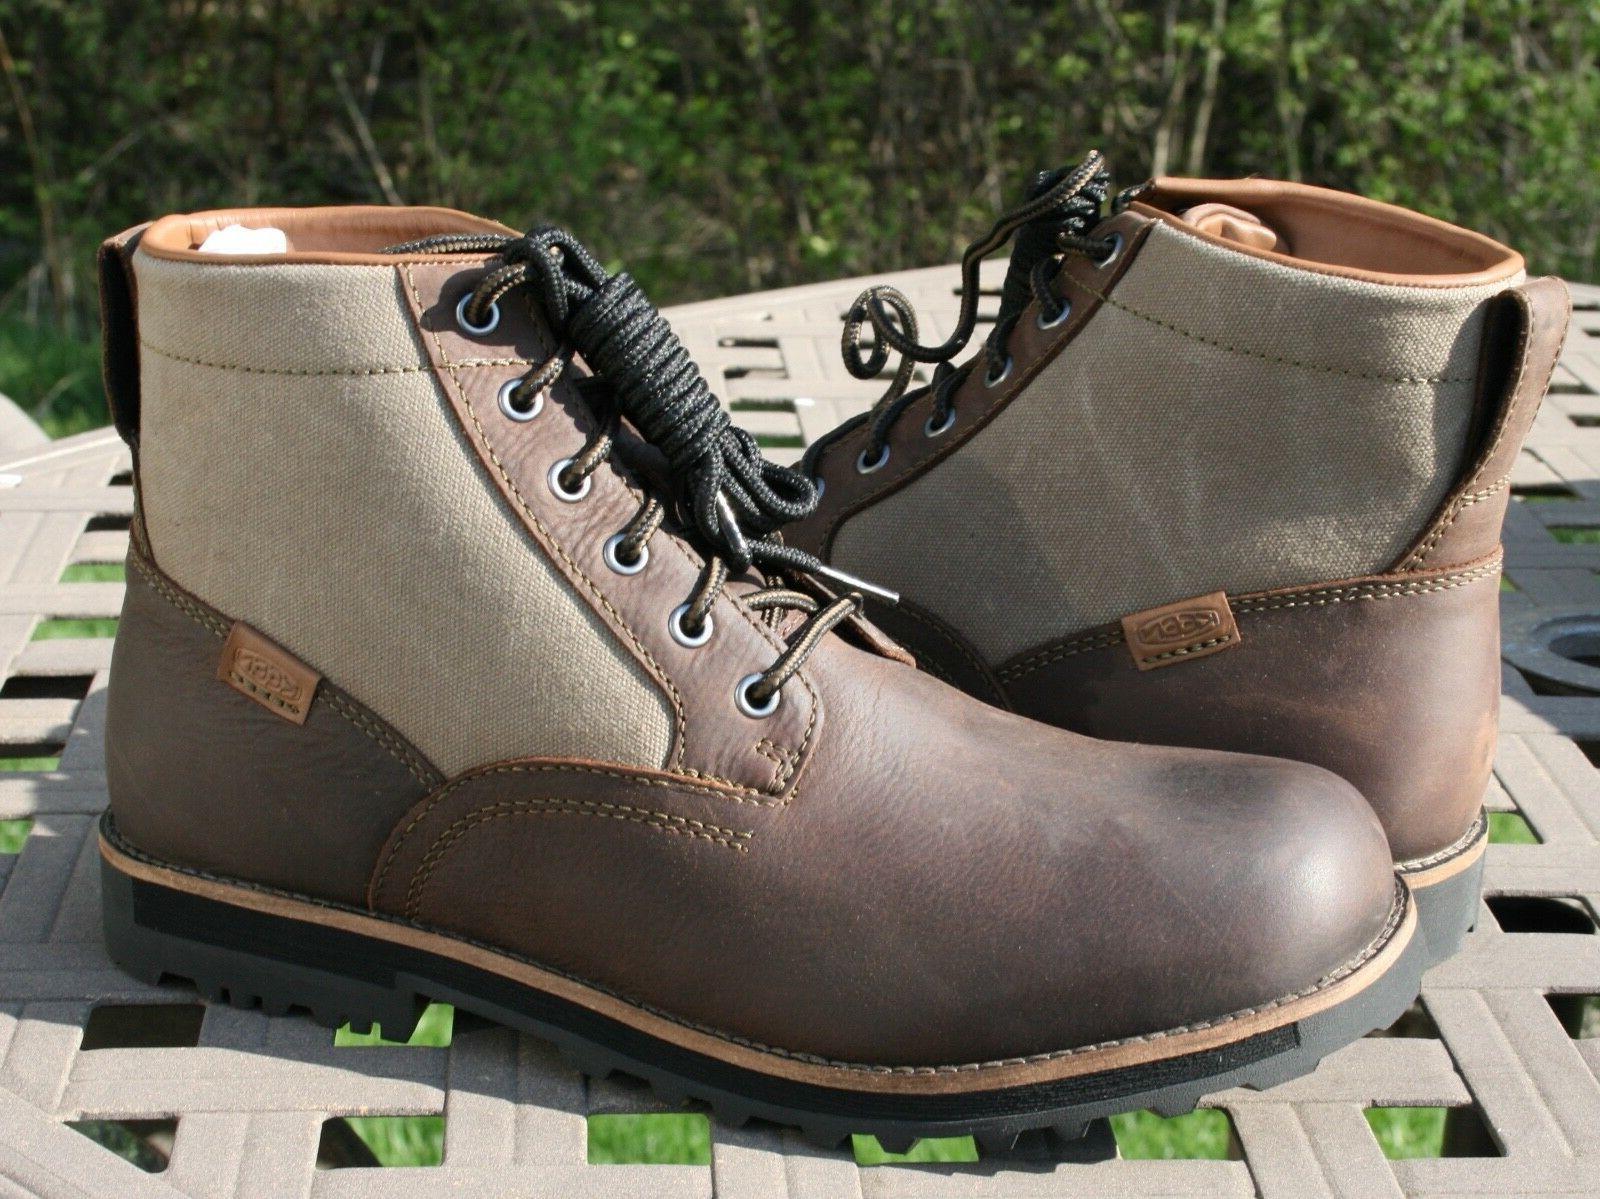 KEEN THE 59 US 11.5 EU 45 Men's Hiking Trail Boot Brown